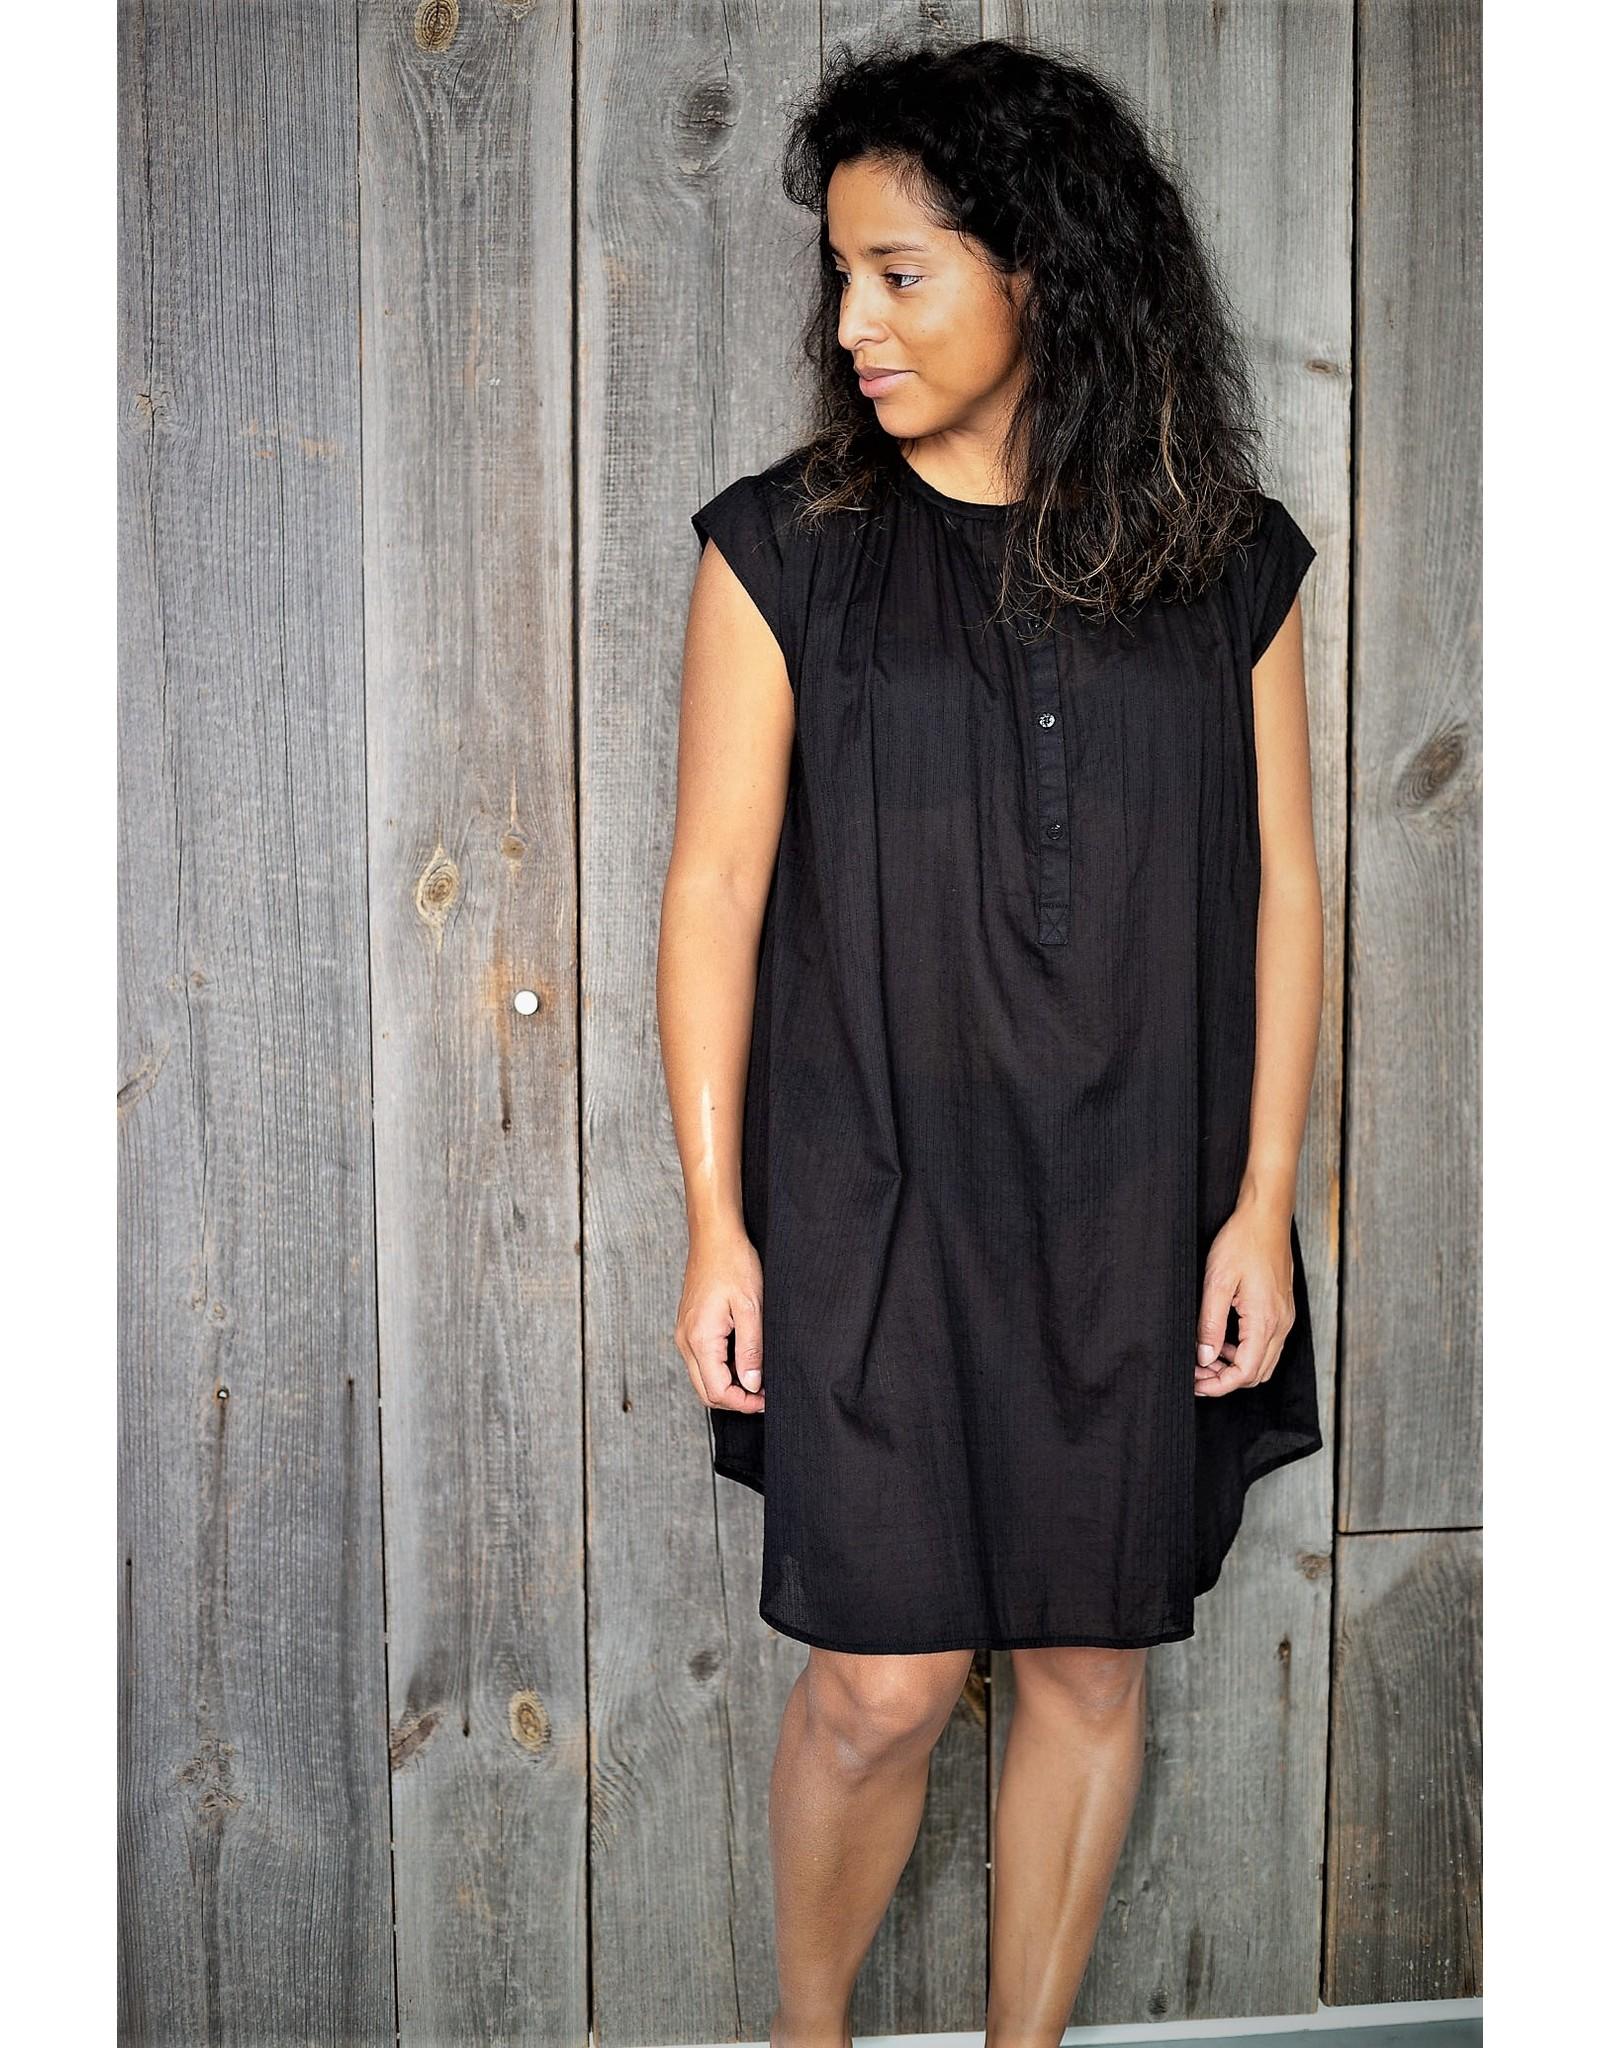 Dorélit Capella | Nightdress | Black